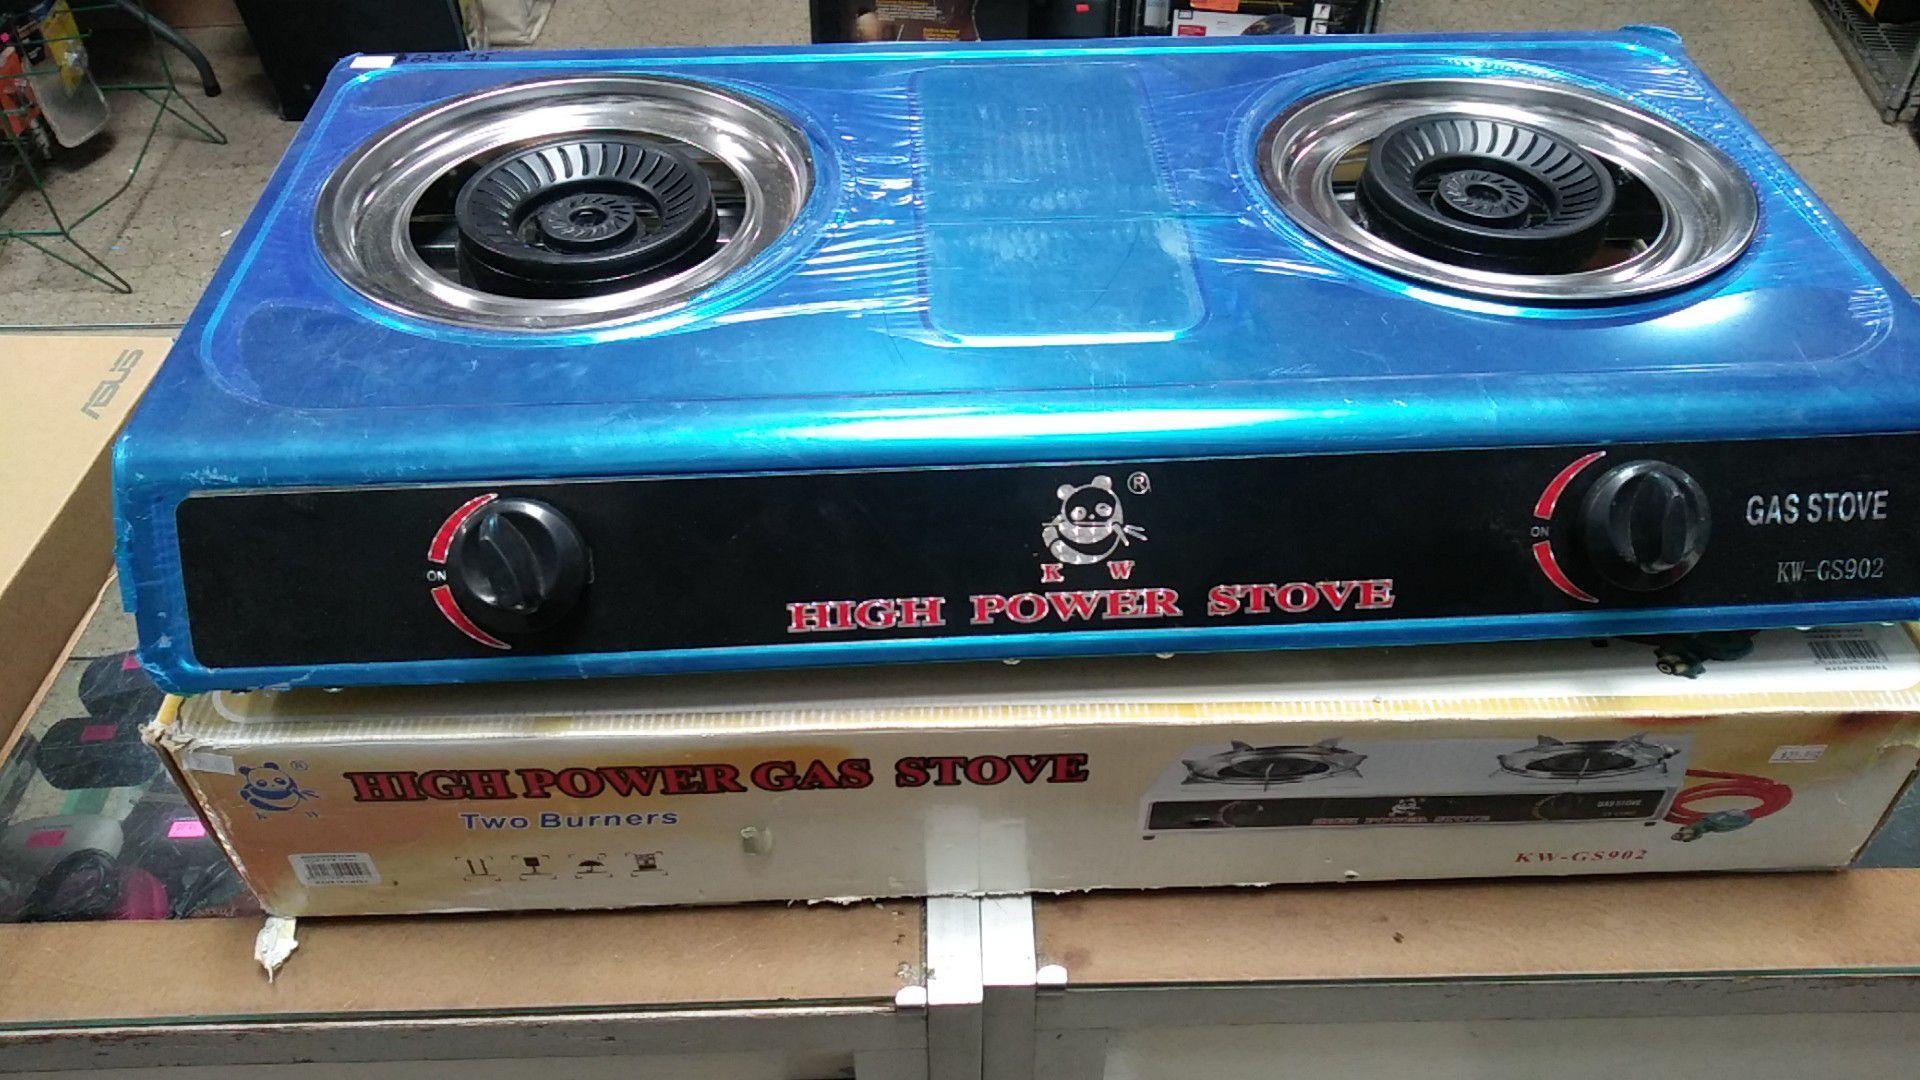 High power stove